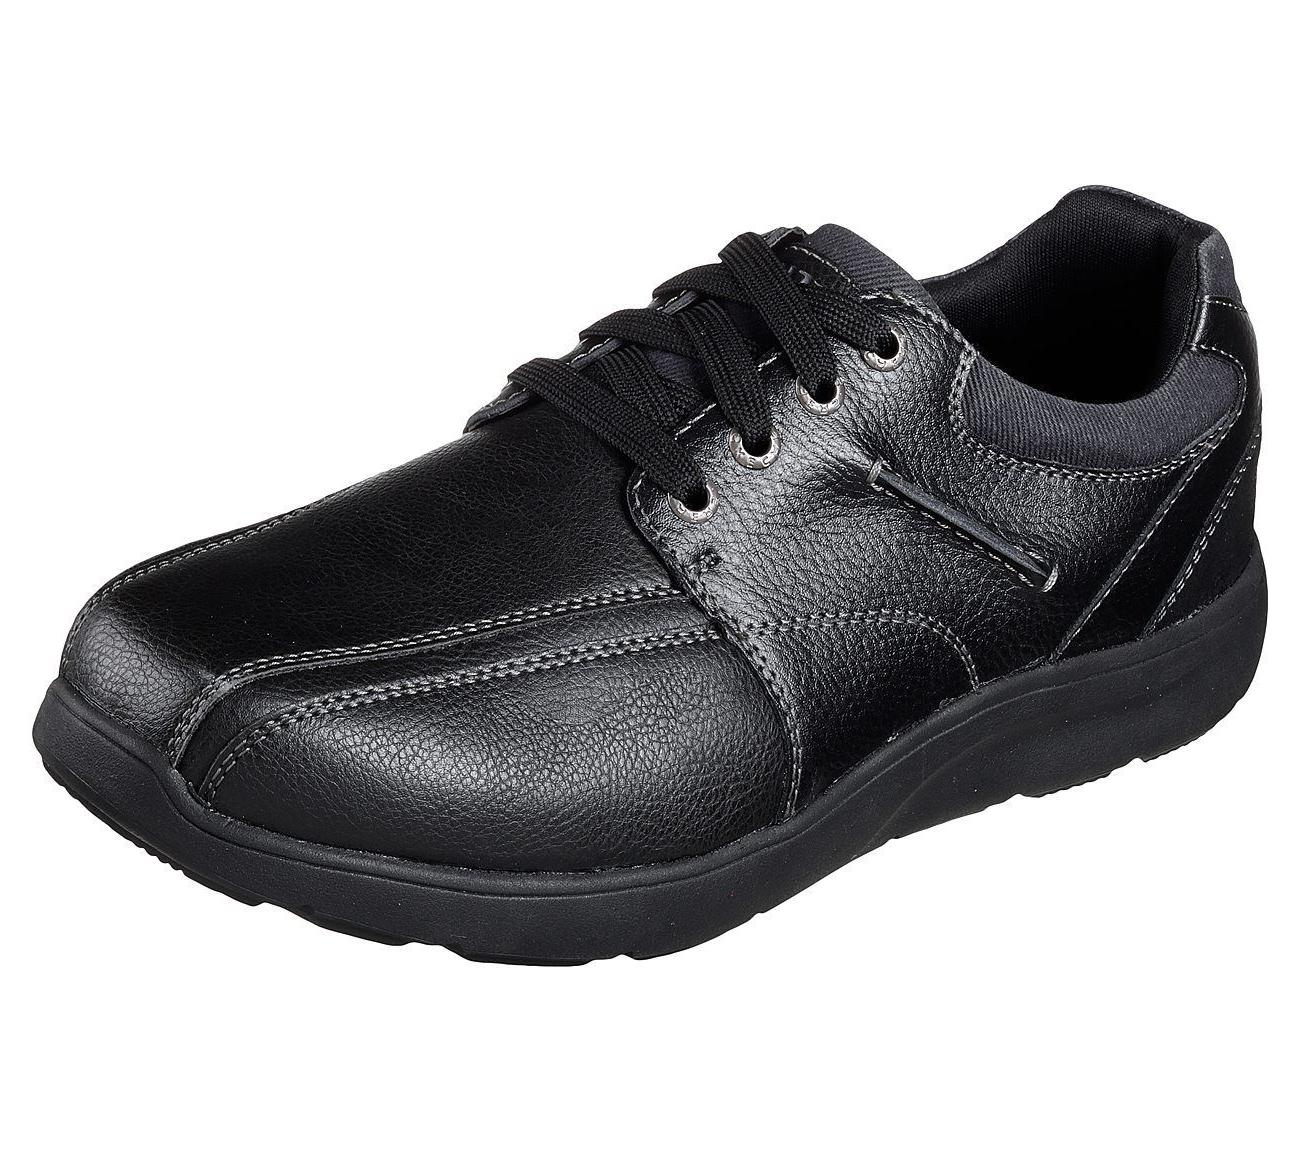 65327 black shoes men memory foam dress